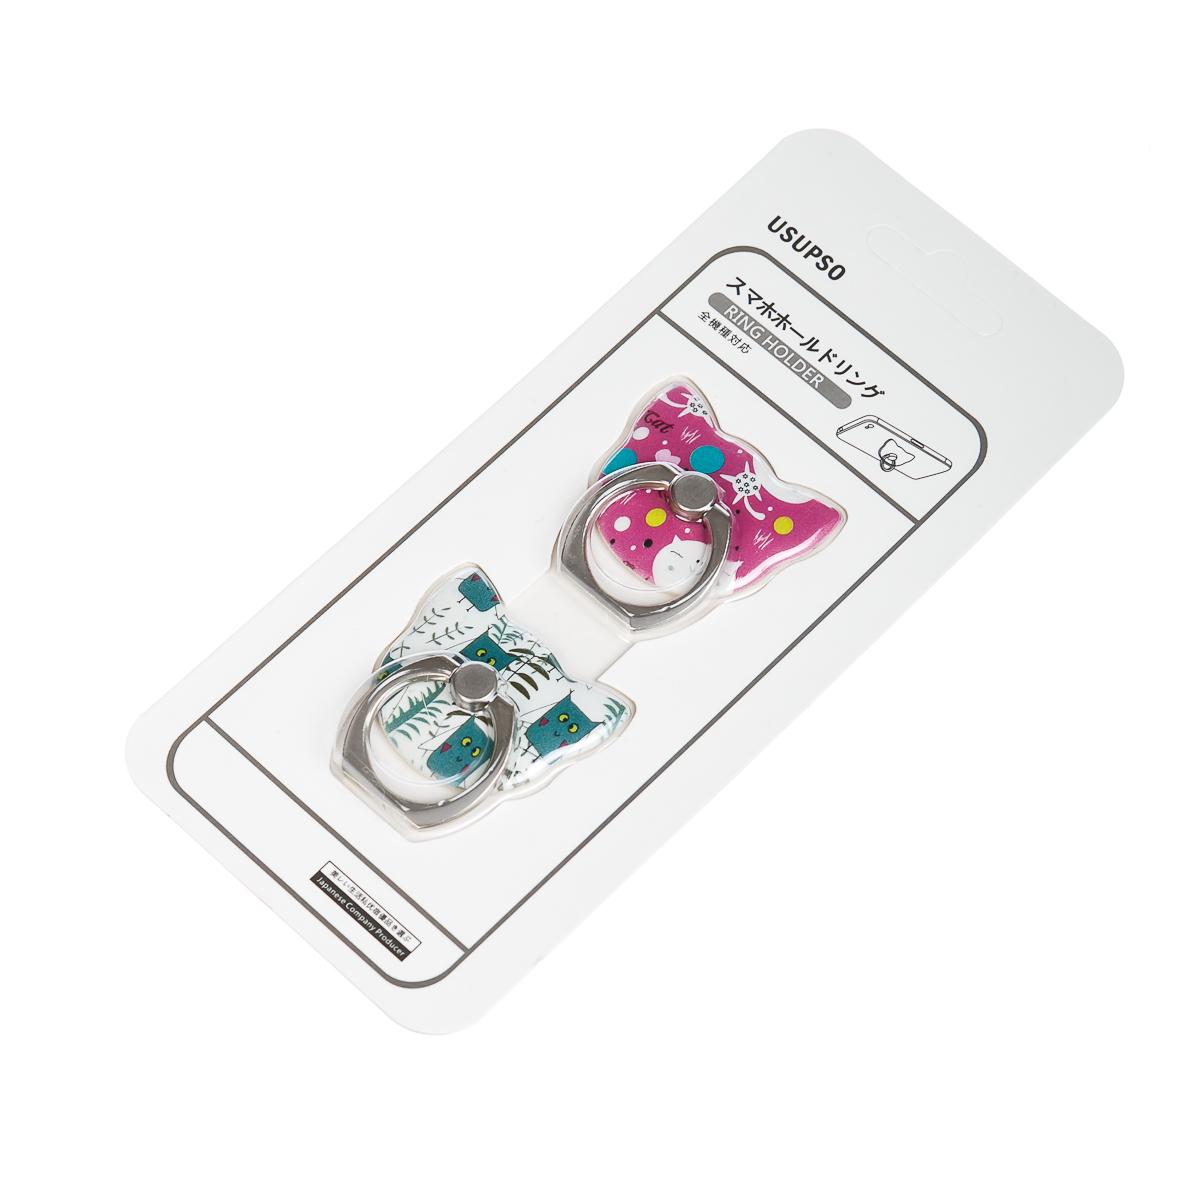 Кольцо для телефона 2 шт. арт.4712111506006